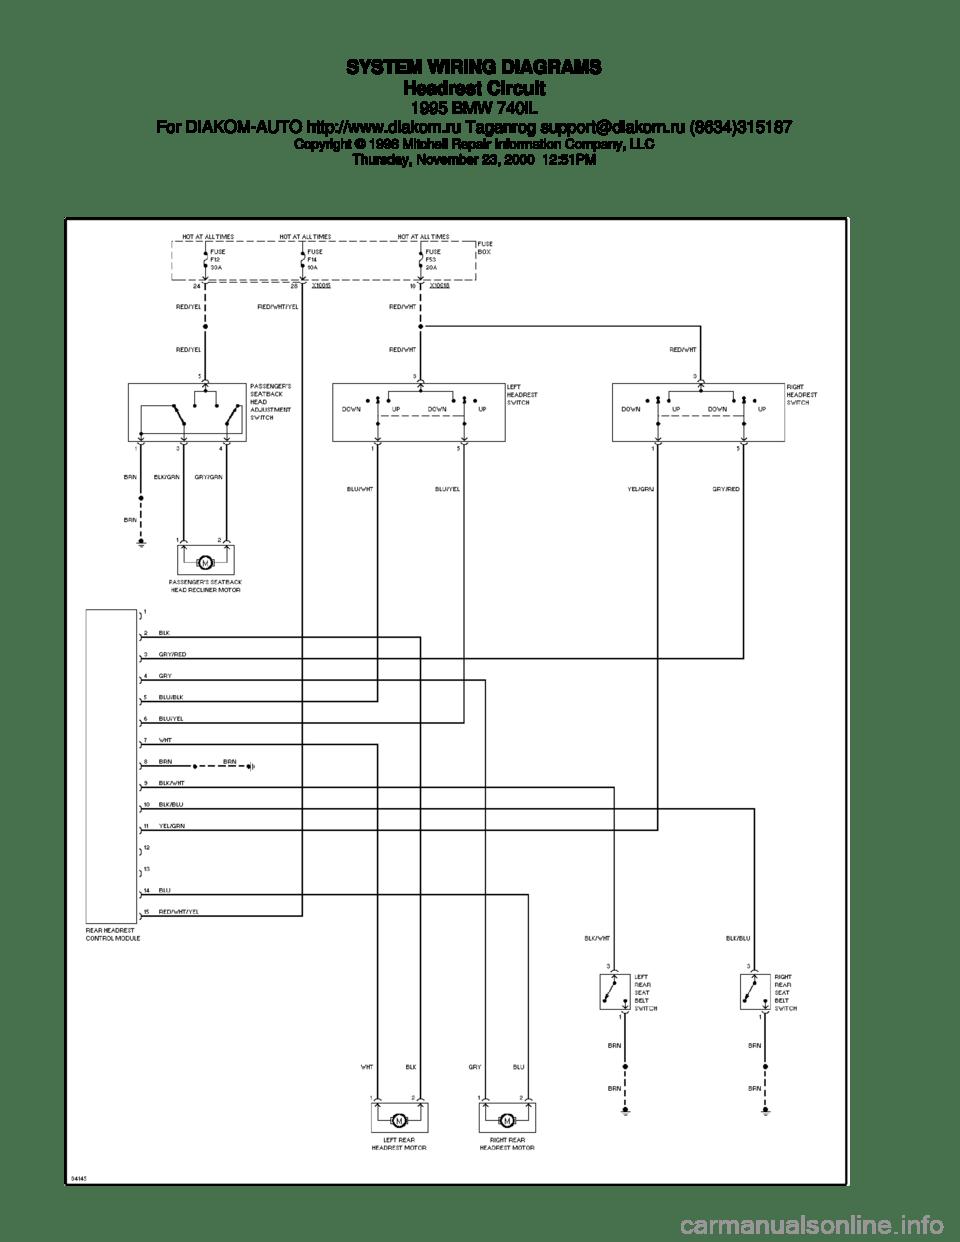 medium resolution of bmw wiring diagram e38 schema wiring diagrams bmw e38 suspension bmw 740i wiring diagram simple wiring